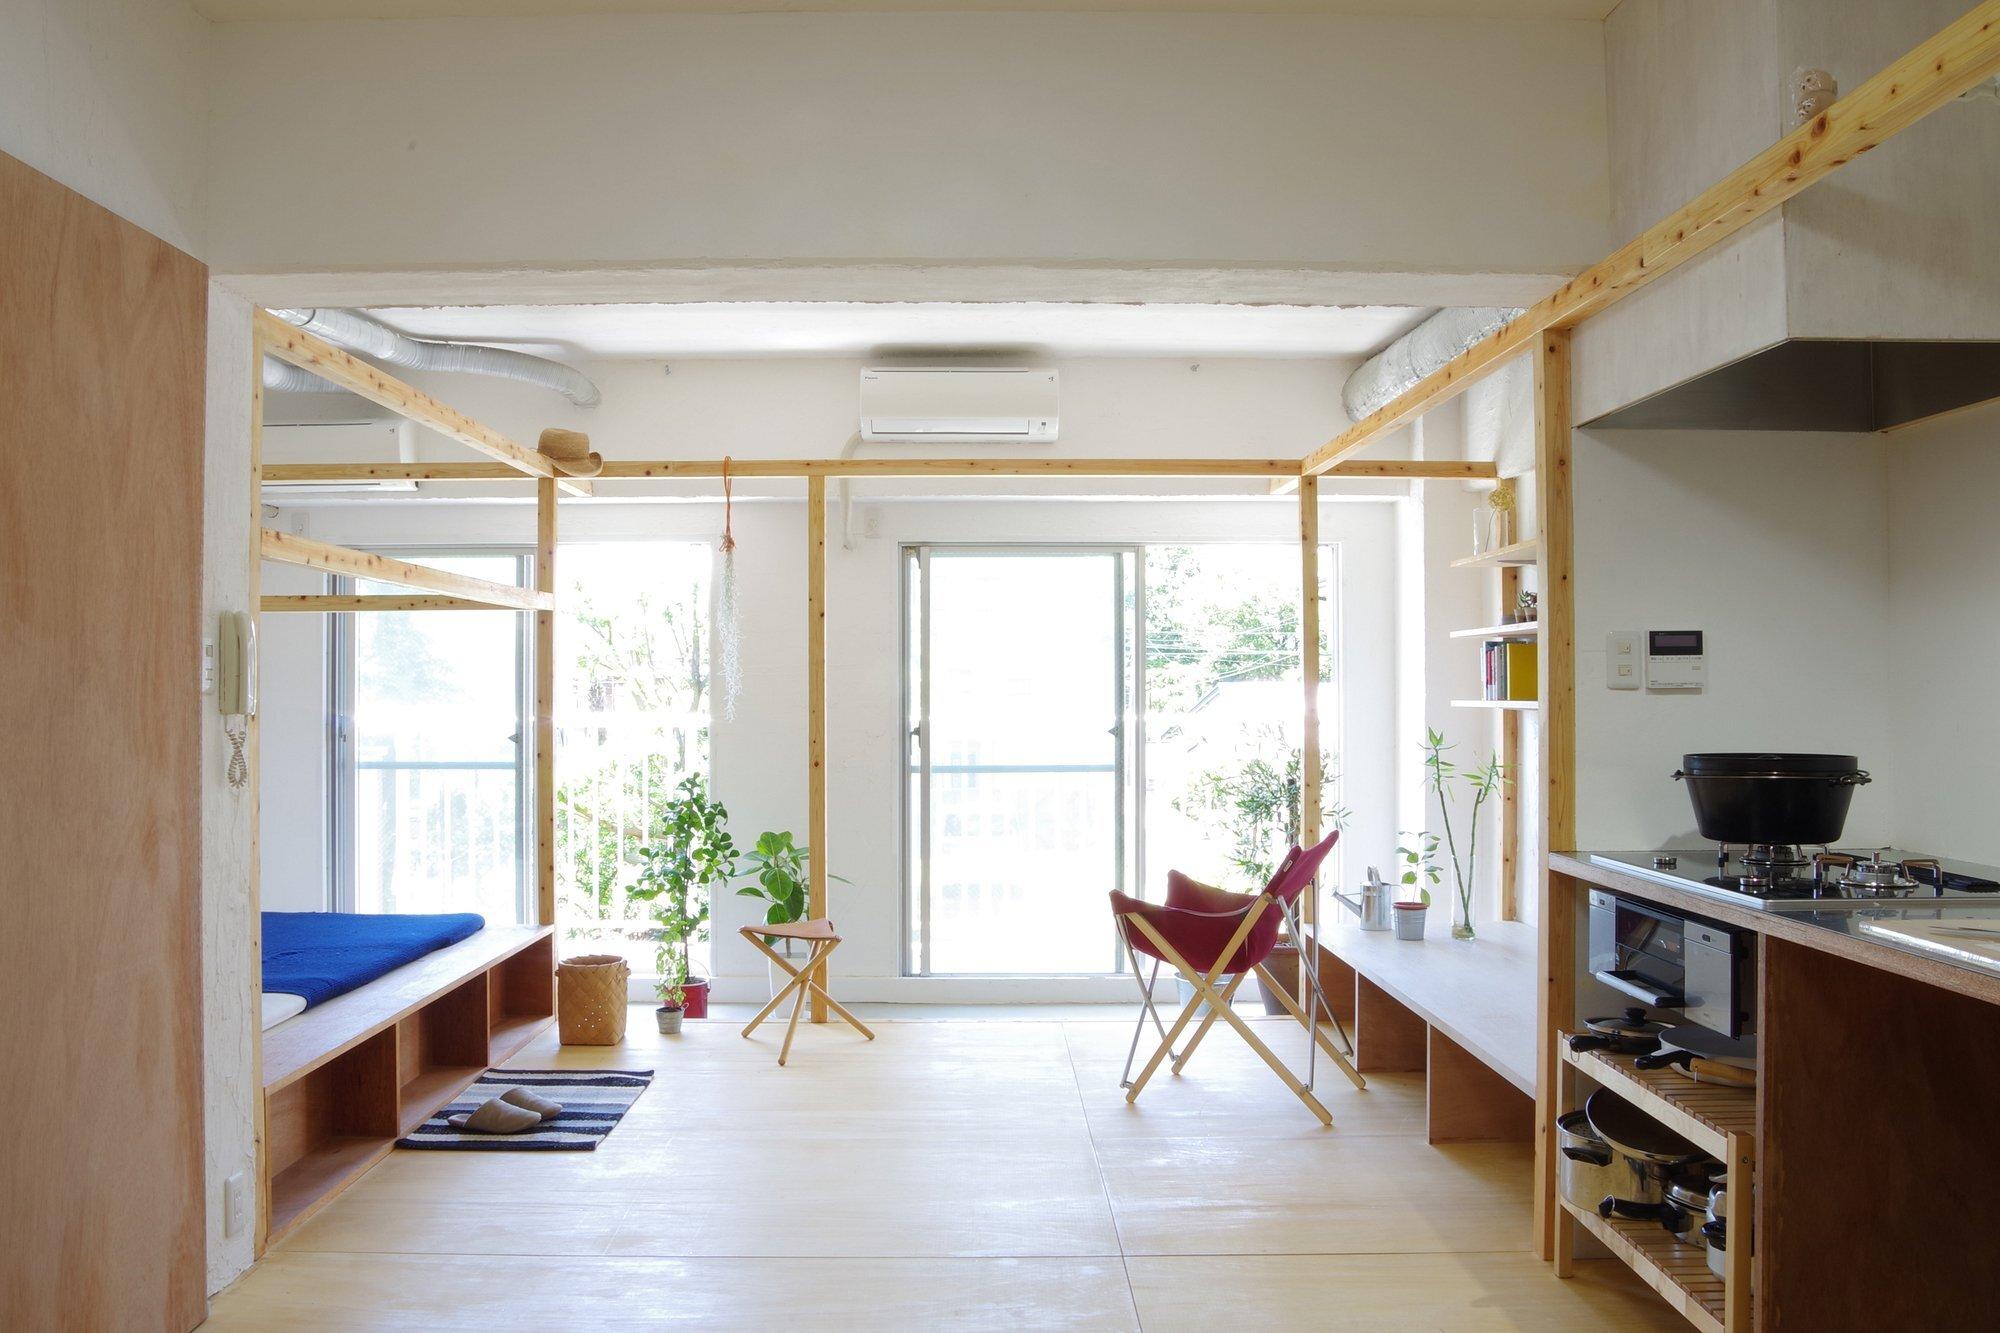 frame-house-peak-studio-kawasaki-japan-living-room-facing-patio-doors-humble-homes